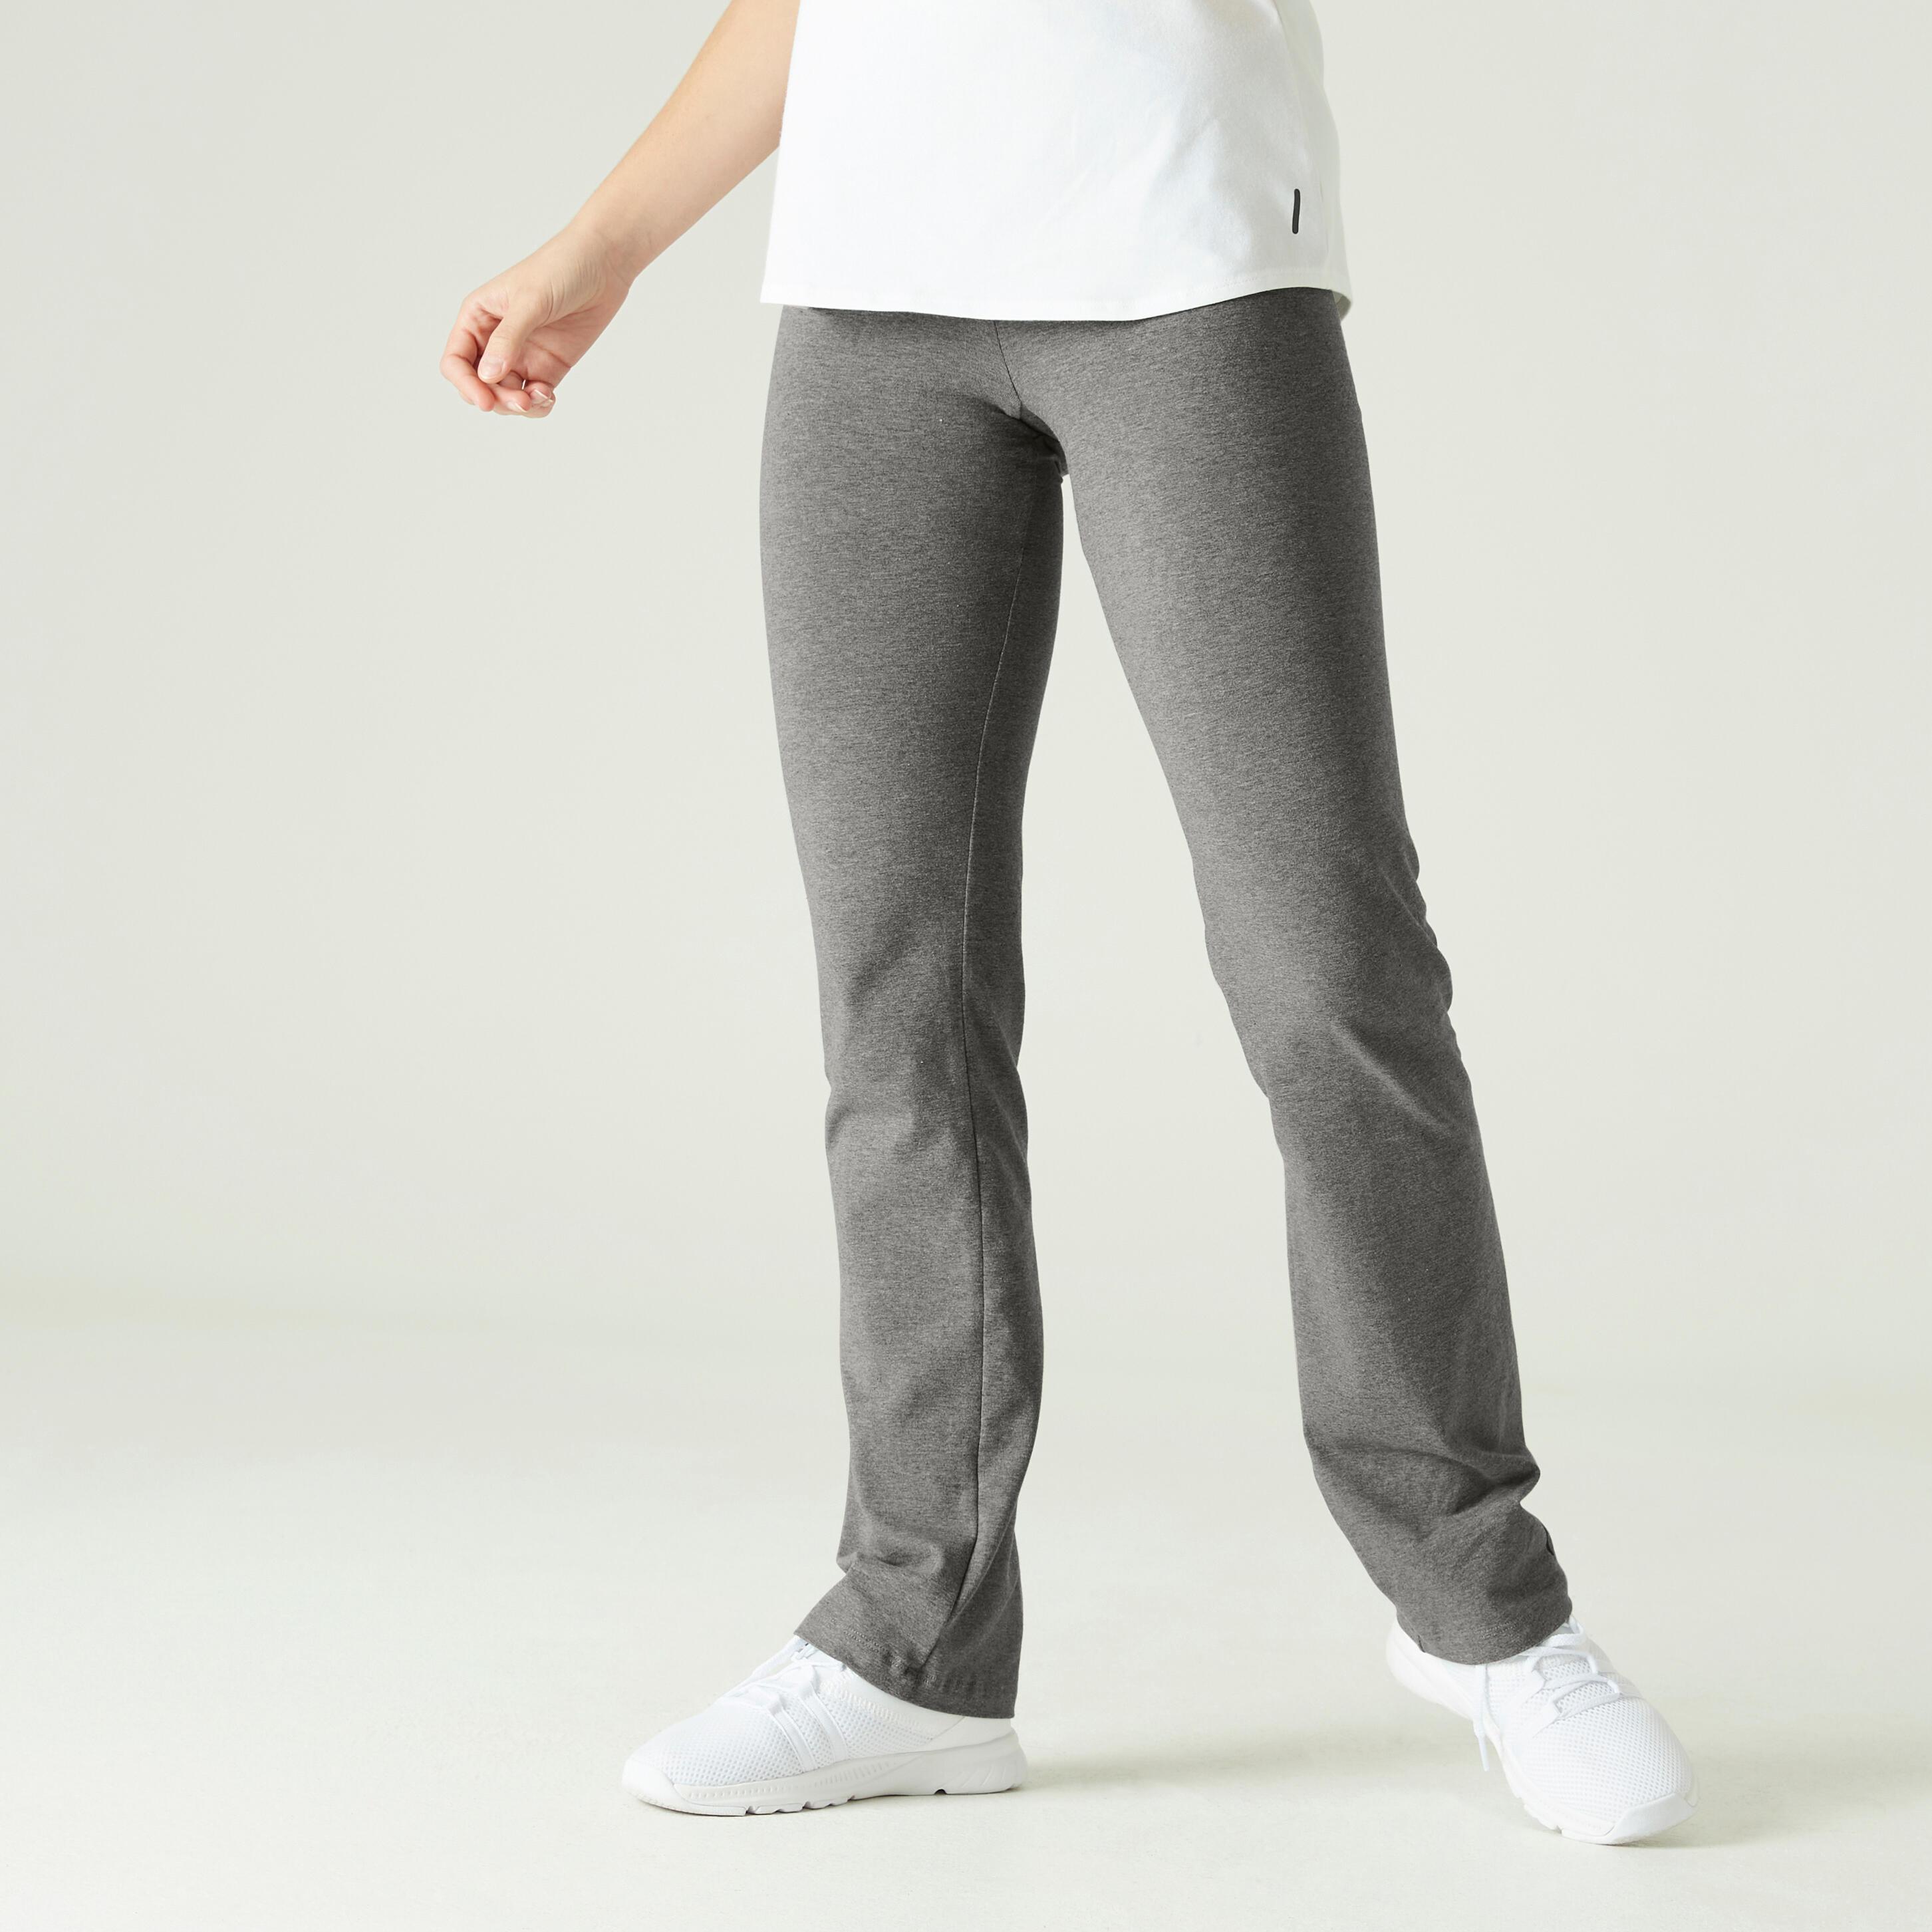 Pantalon 500 Gri Damă la Reducere poza